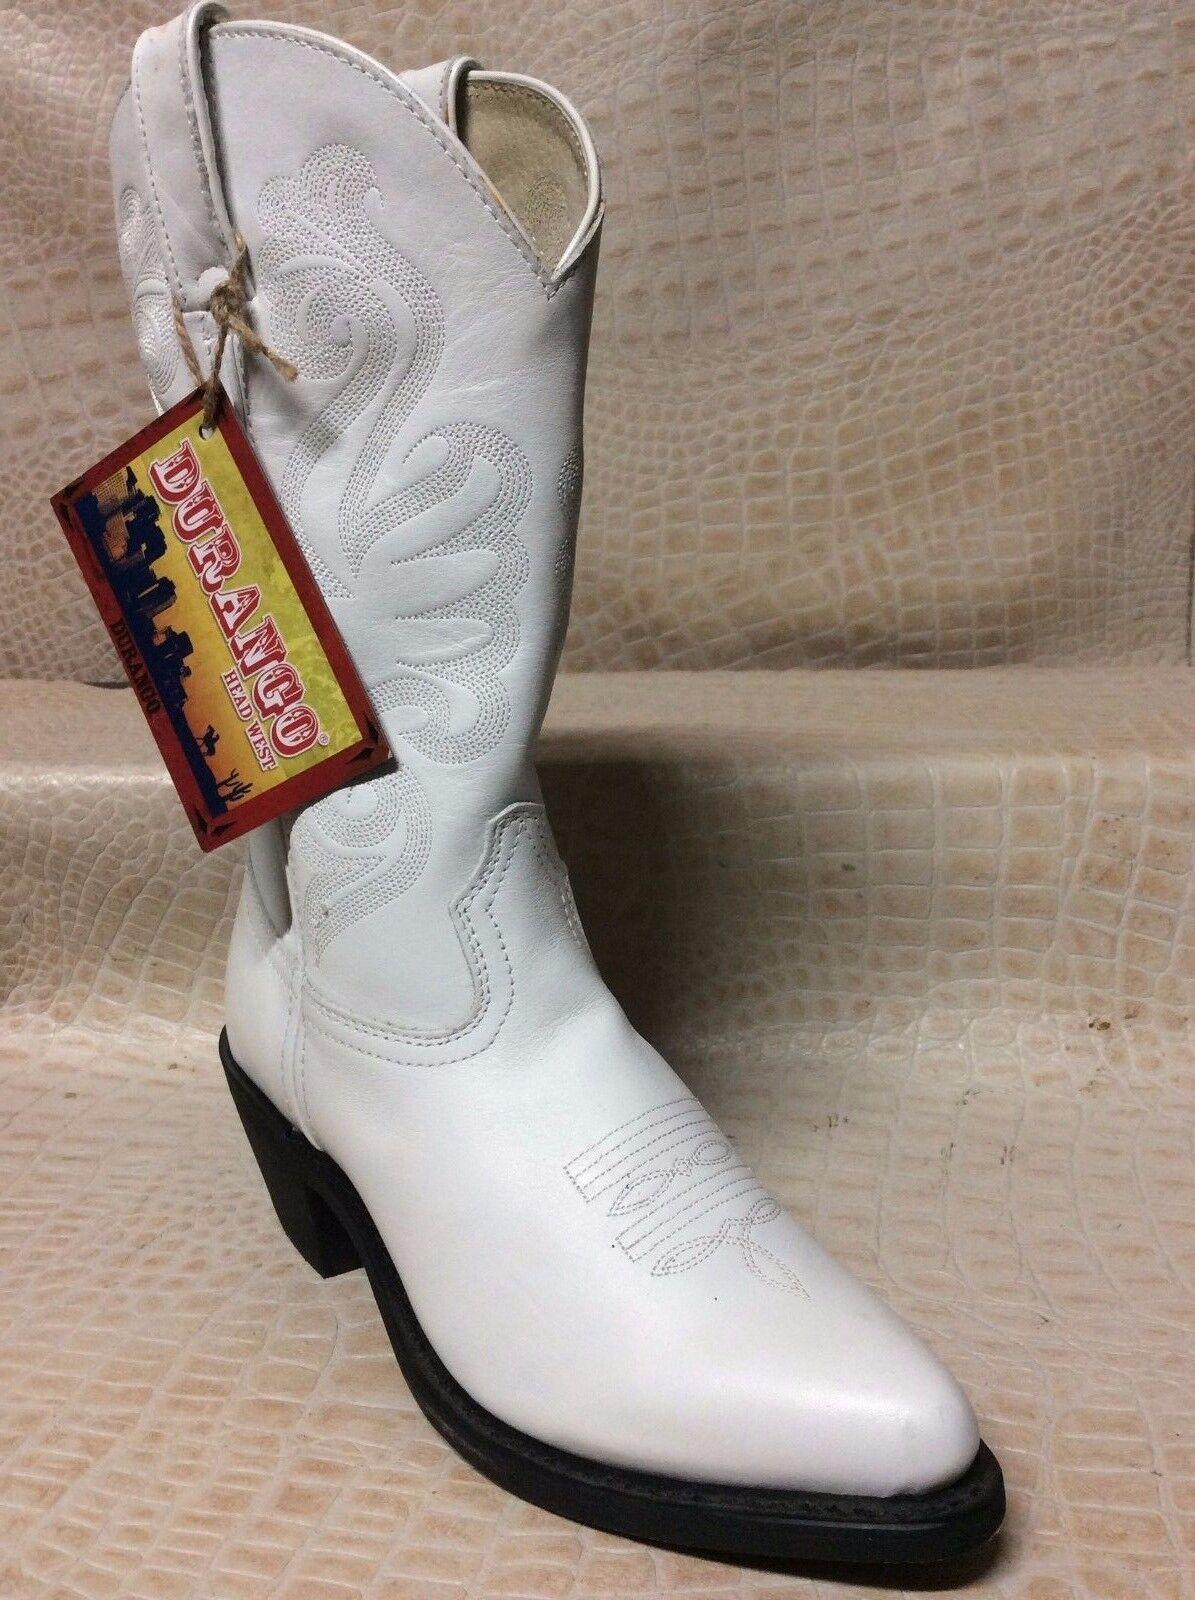 Womens Durango Cowgirl Leather Ladies Fashion Western White Cowboy Boots